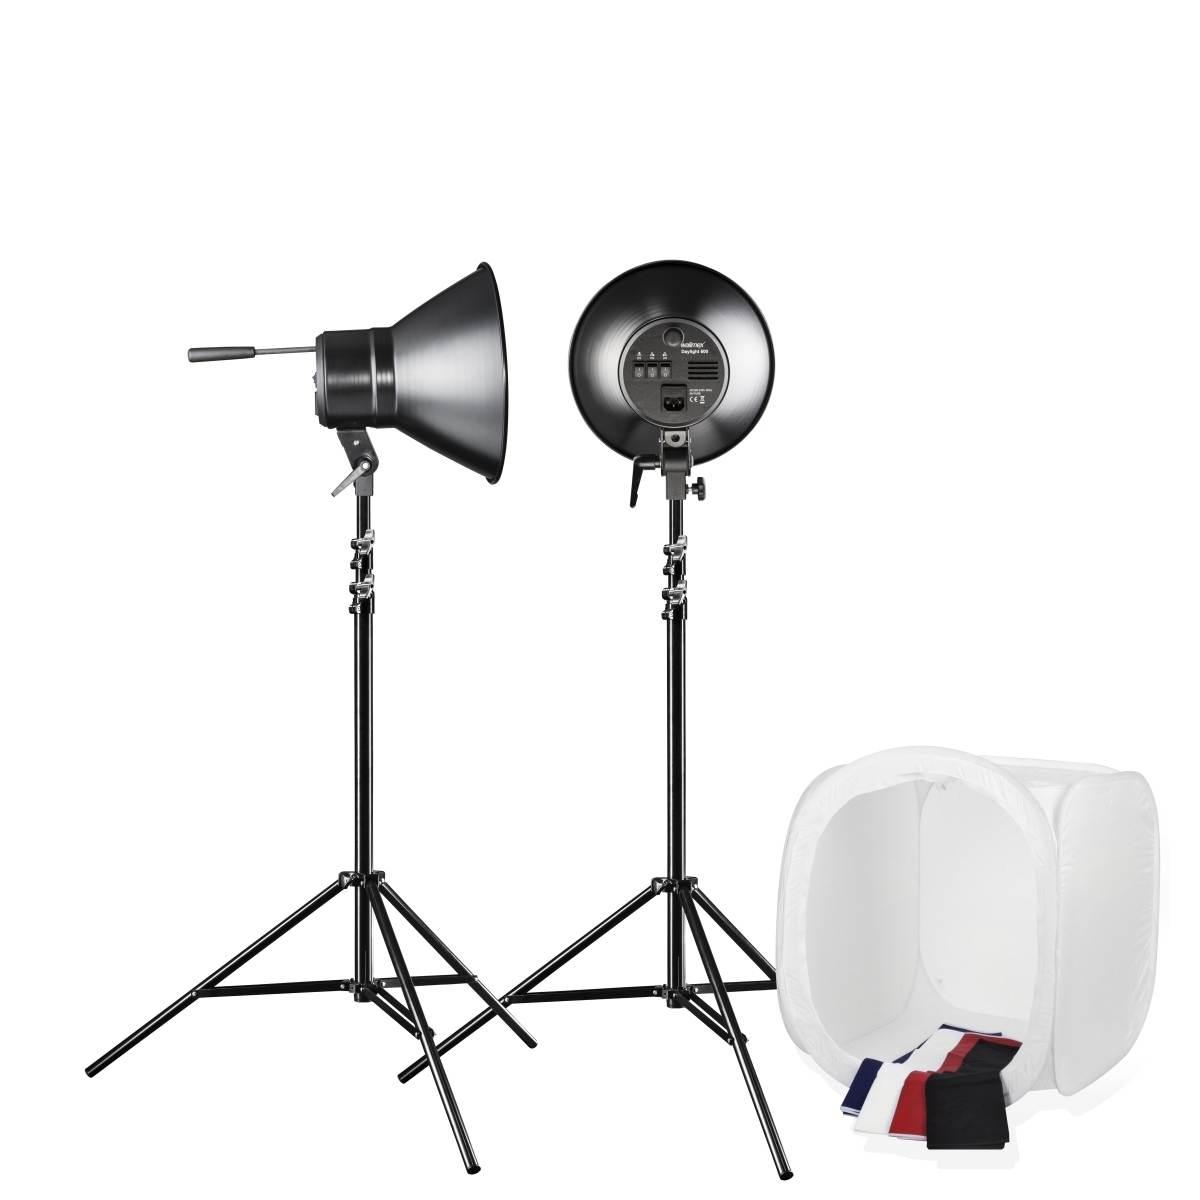 Walimex Studioset Daylight 600/600 with Light Tent